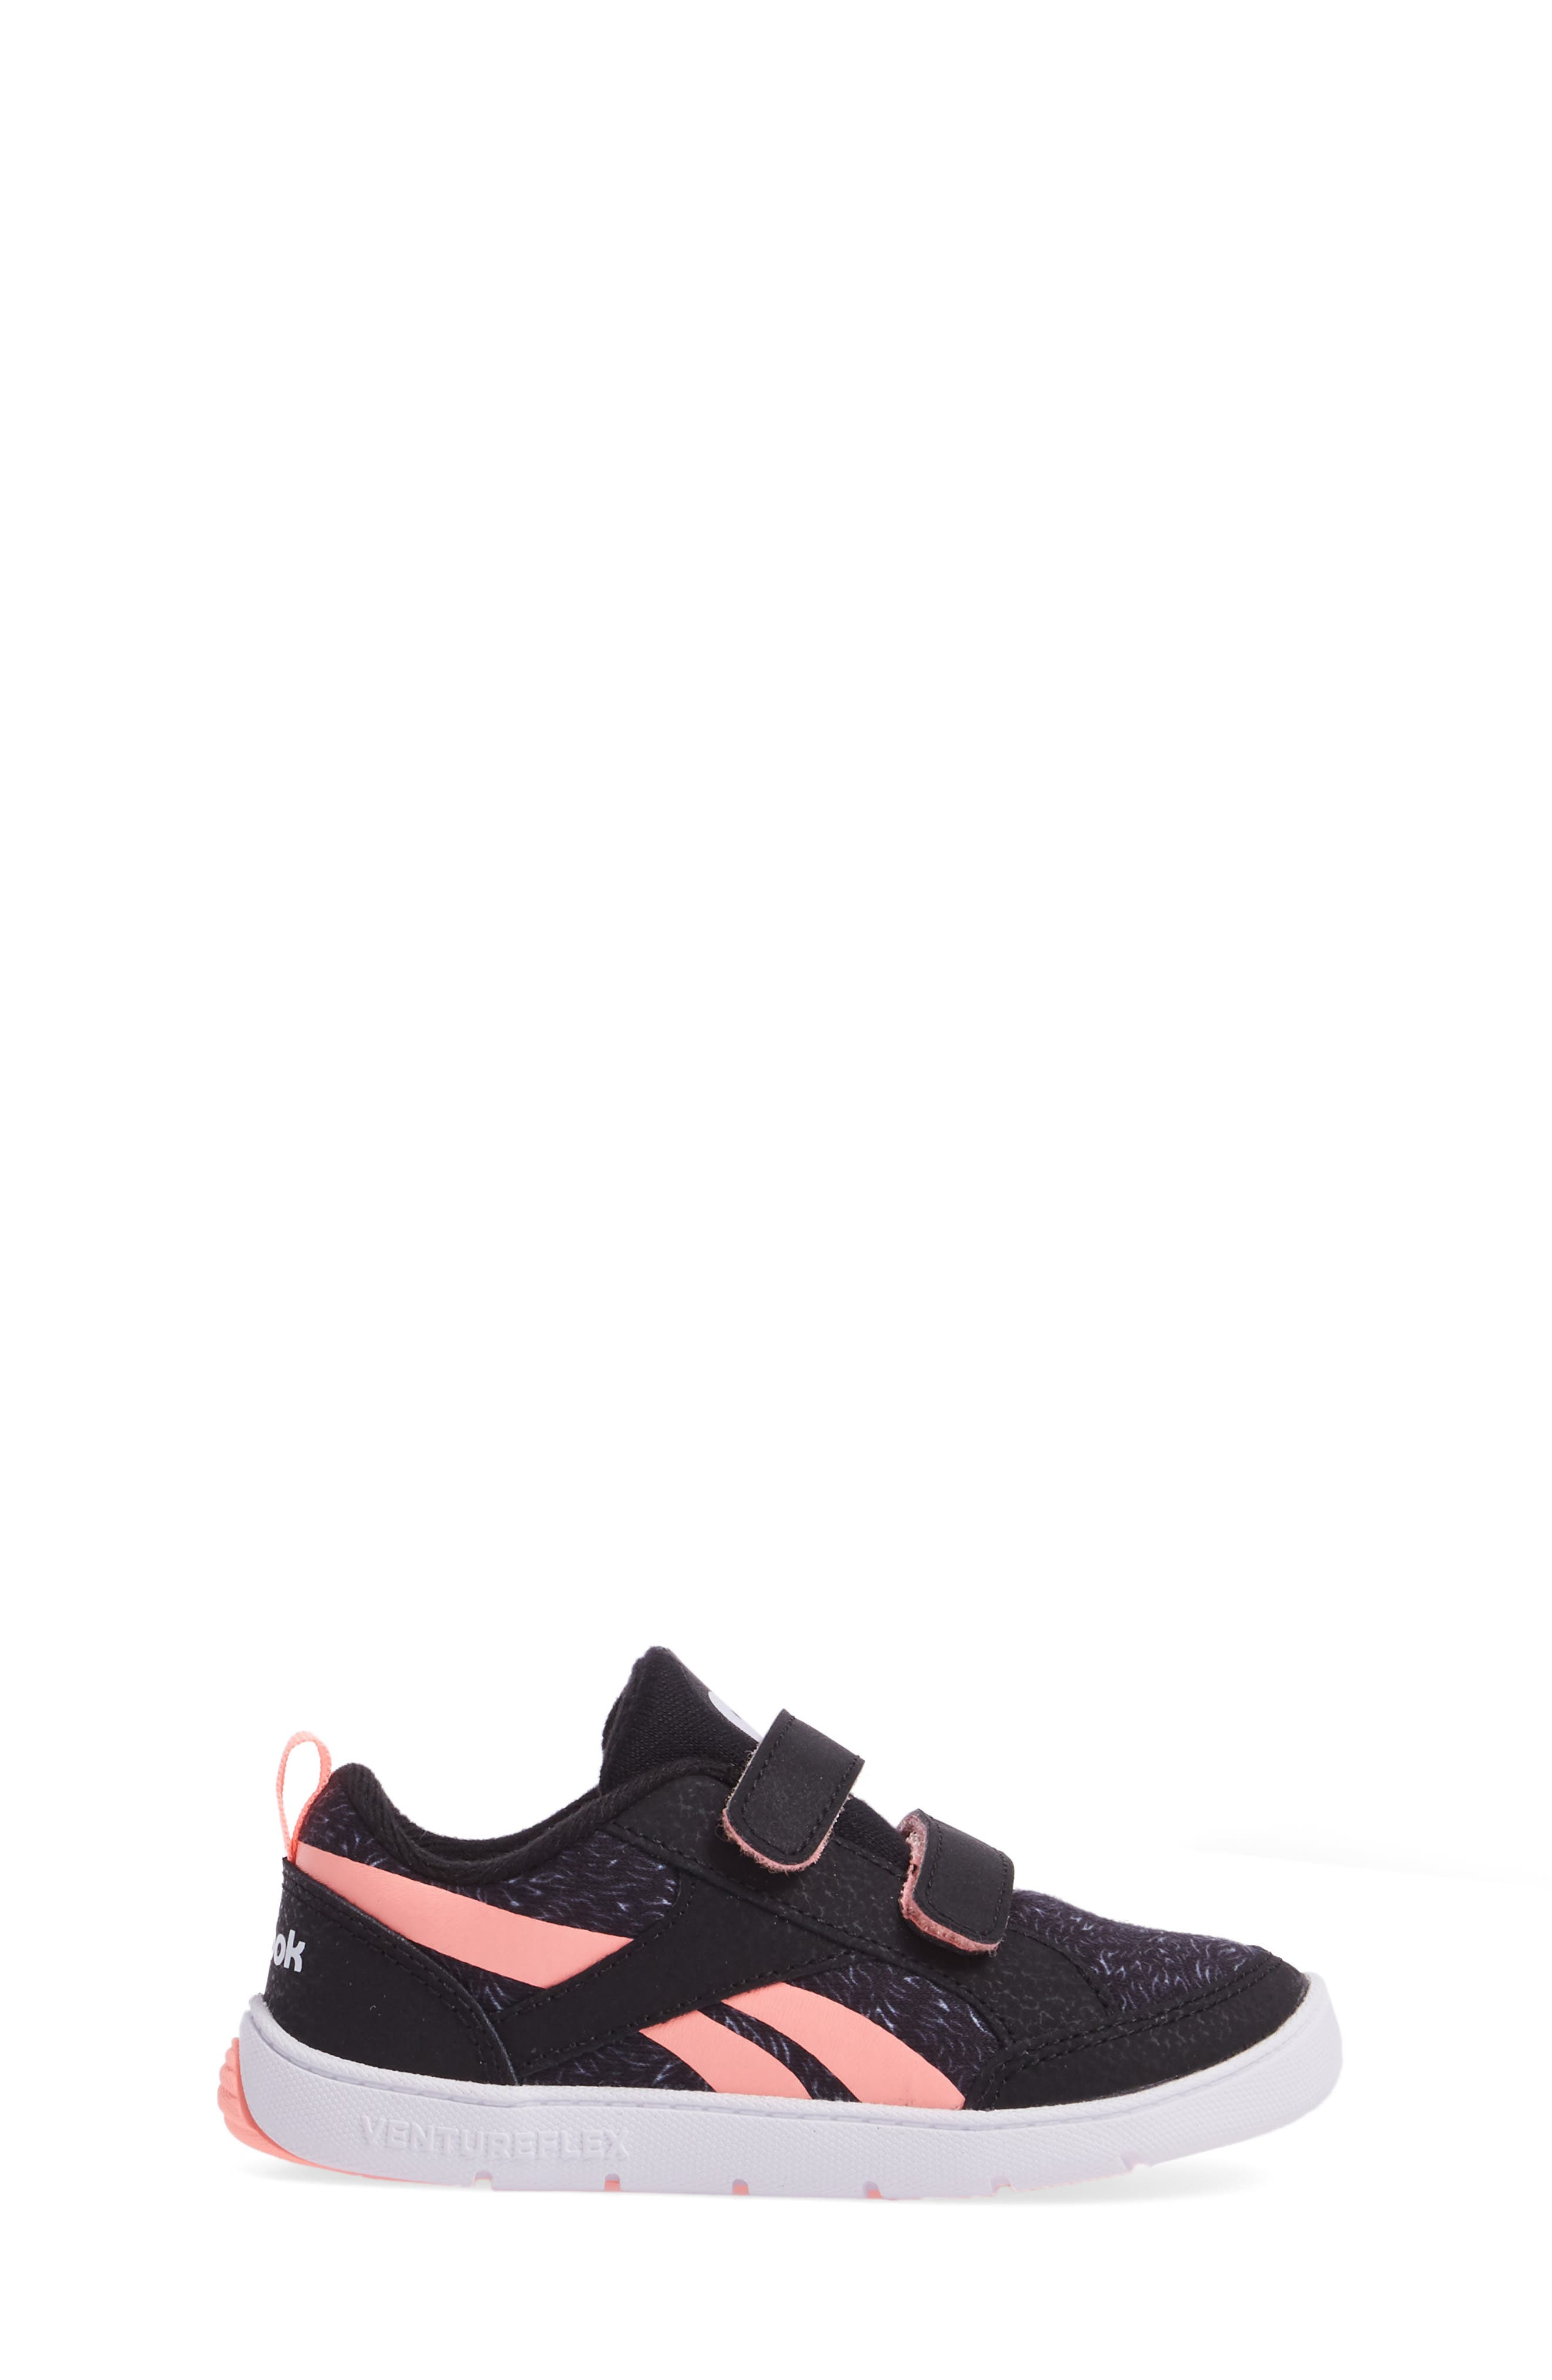 Ventureflex Critter Feet Sneaker,                             Alternate thumbnail 3, color,                             Artic Black/ White/ Sour Melon